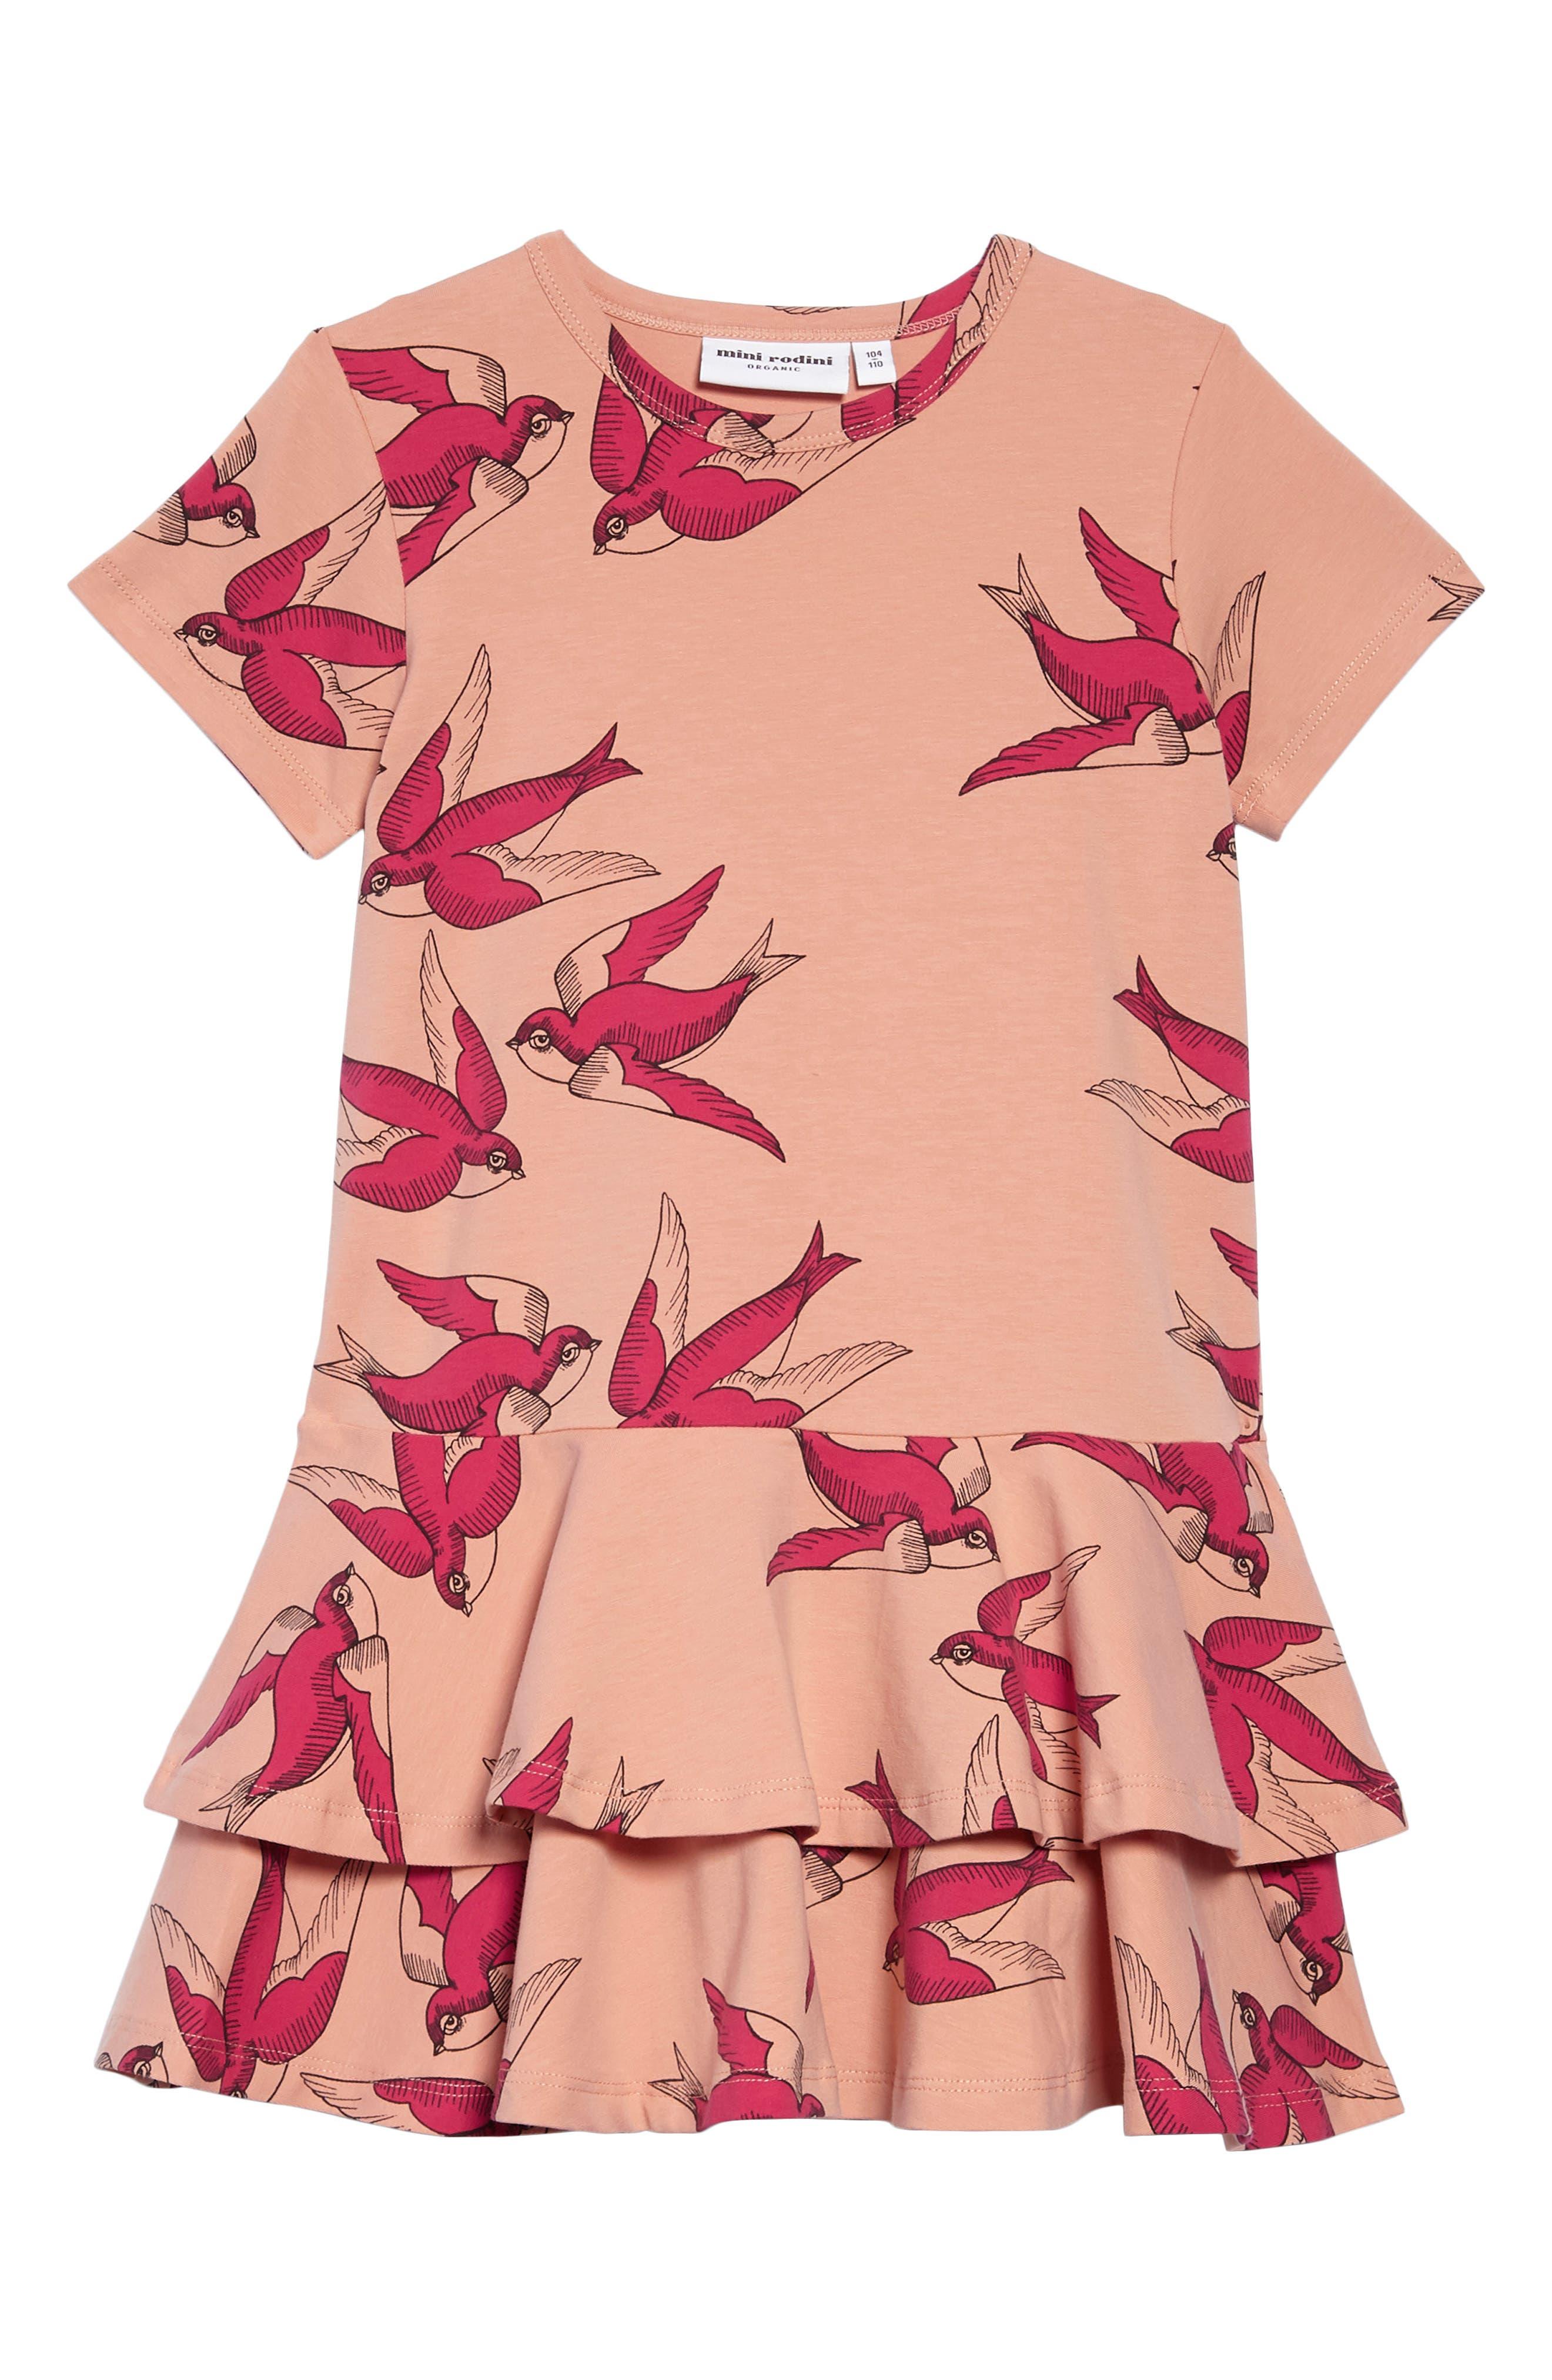 Main Image - Mini Rodini Swallows Frill Dress (Toddler Girls & Little Girls)